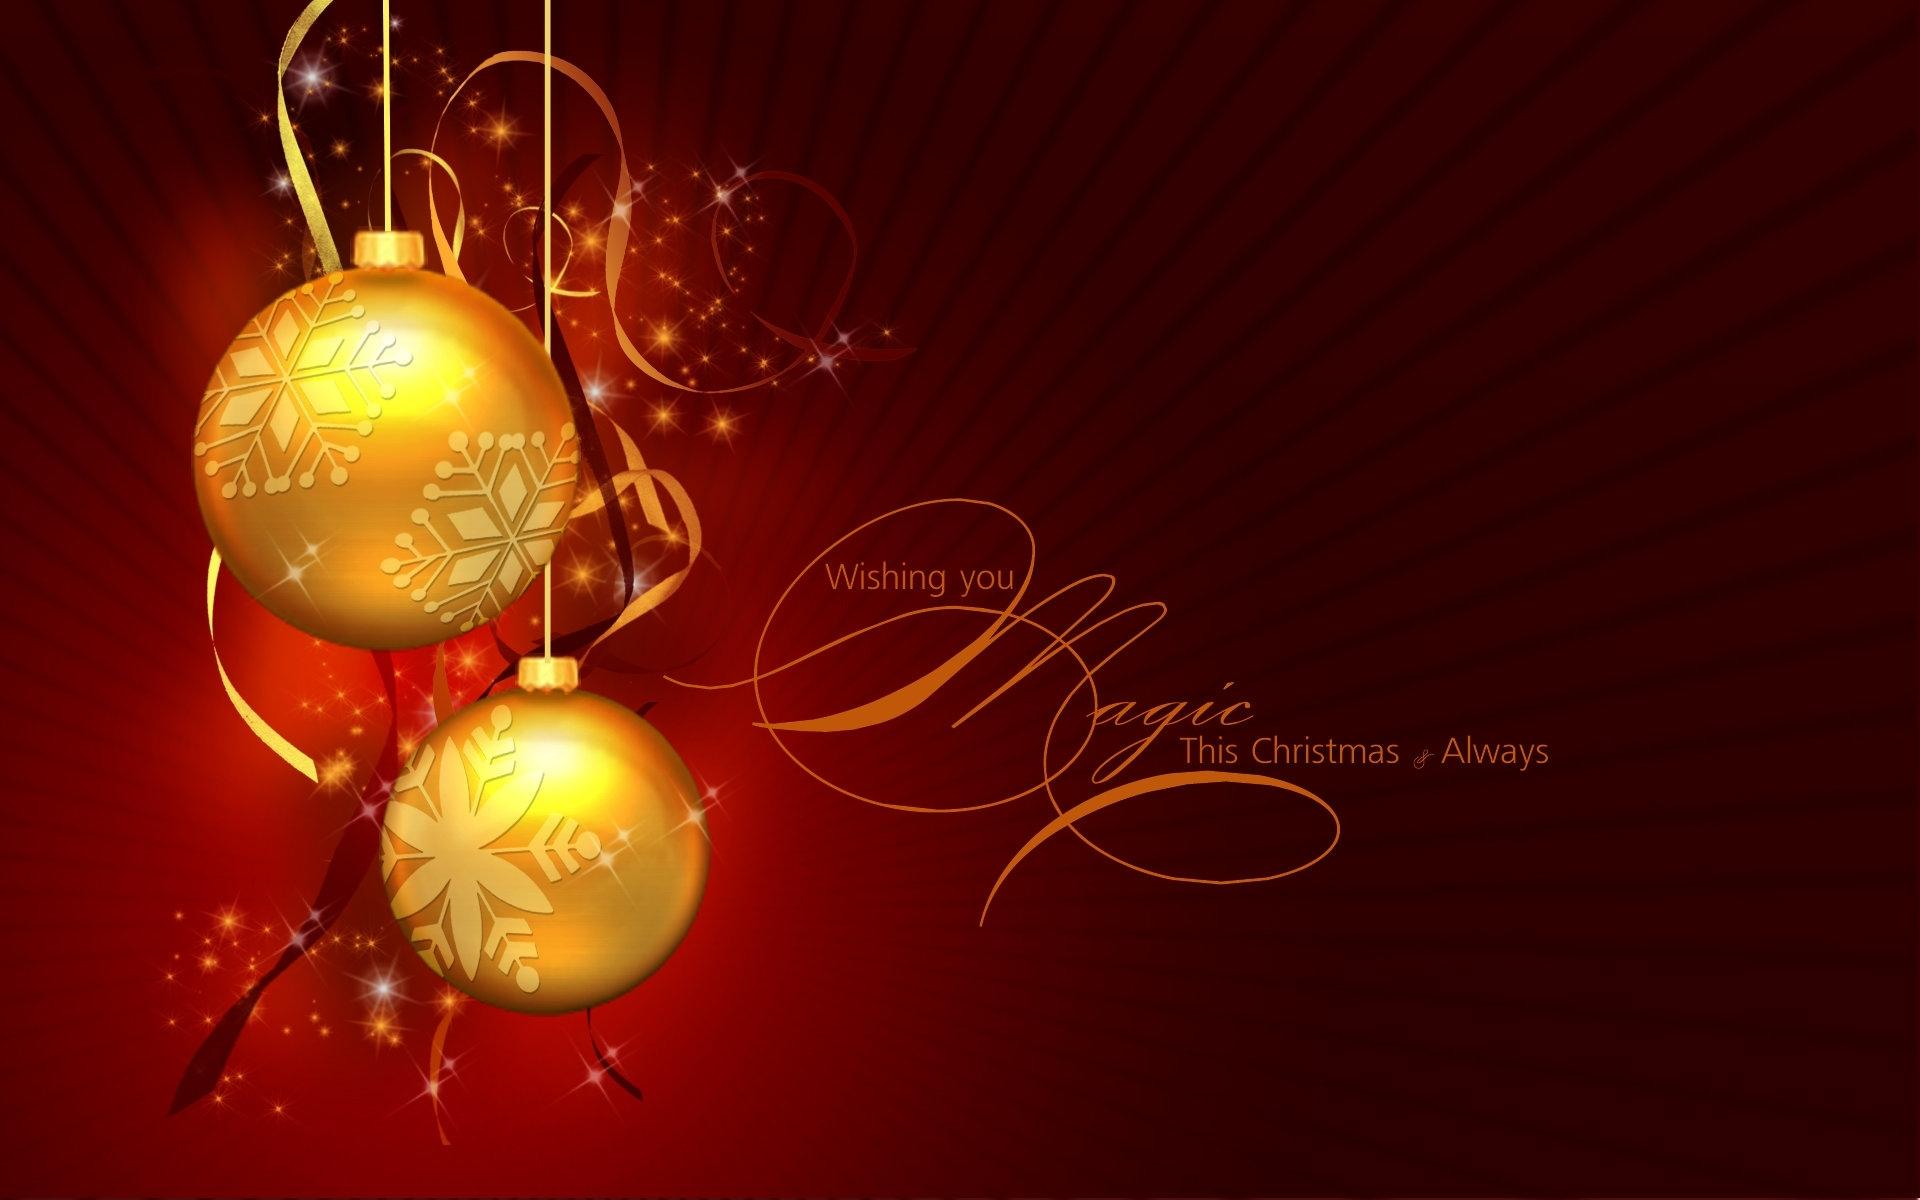 a magic christmasdigitalphenom | holidays | pinterest